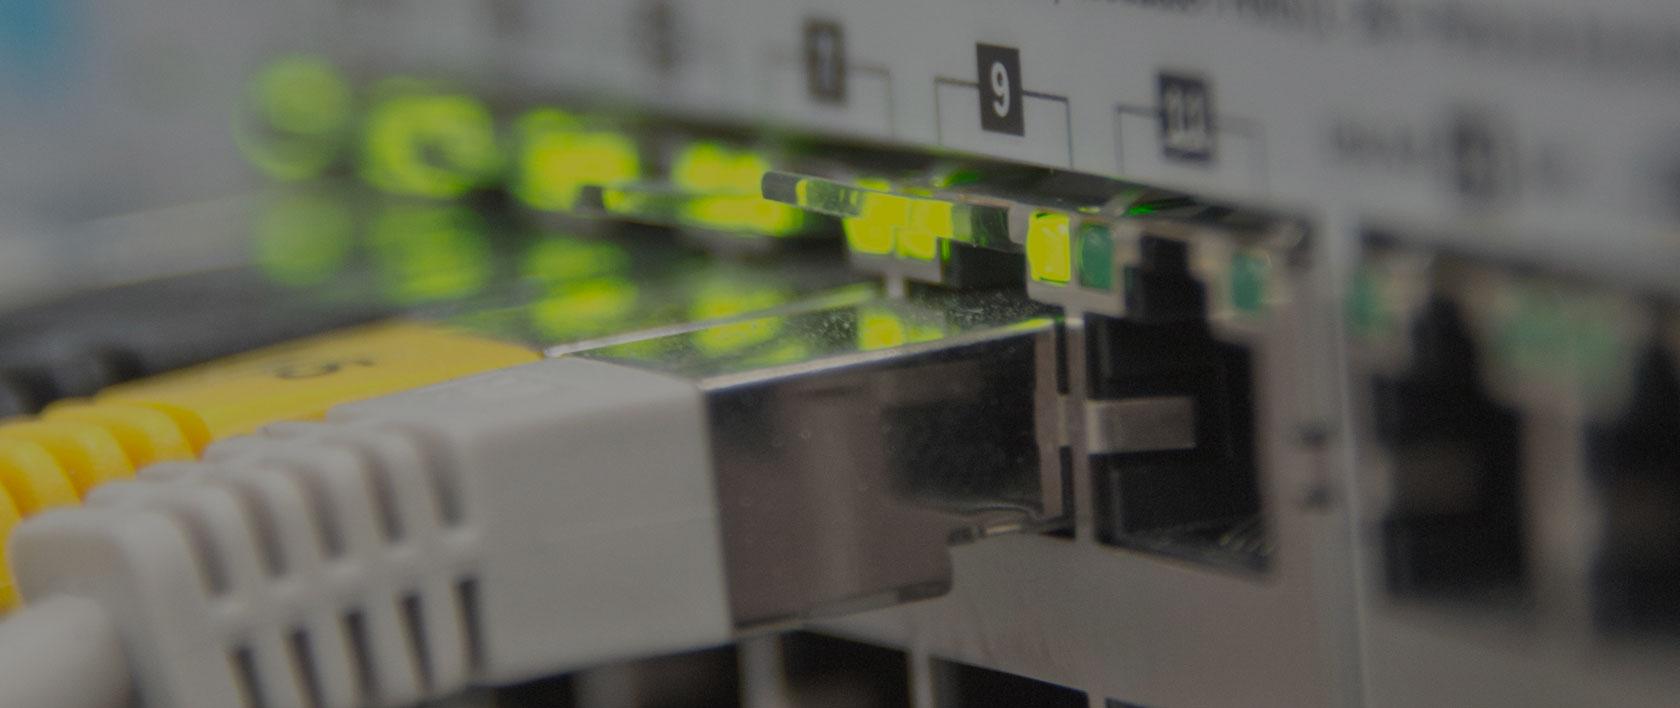 auditoria de redes informaticas, certificacion de red